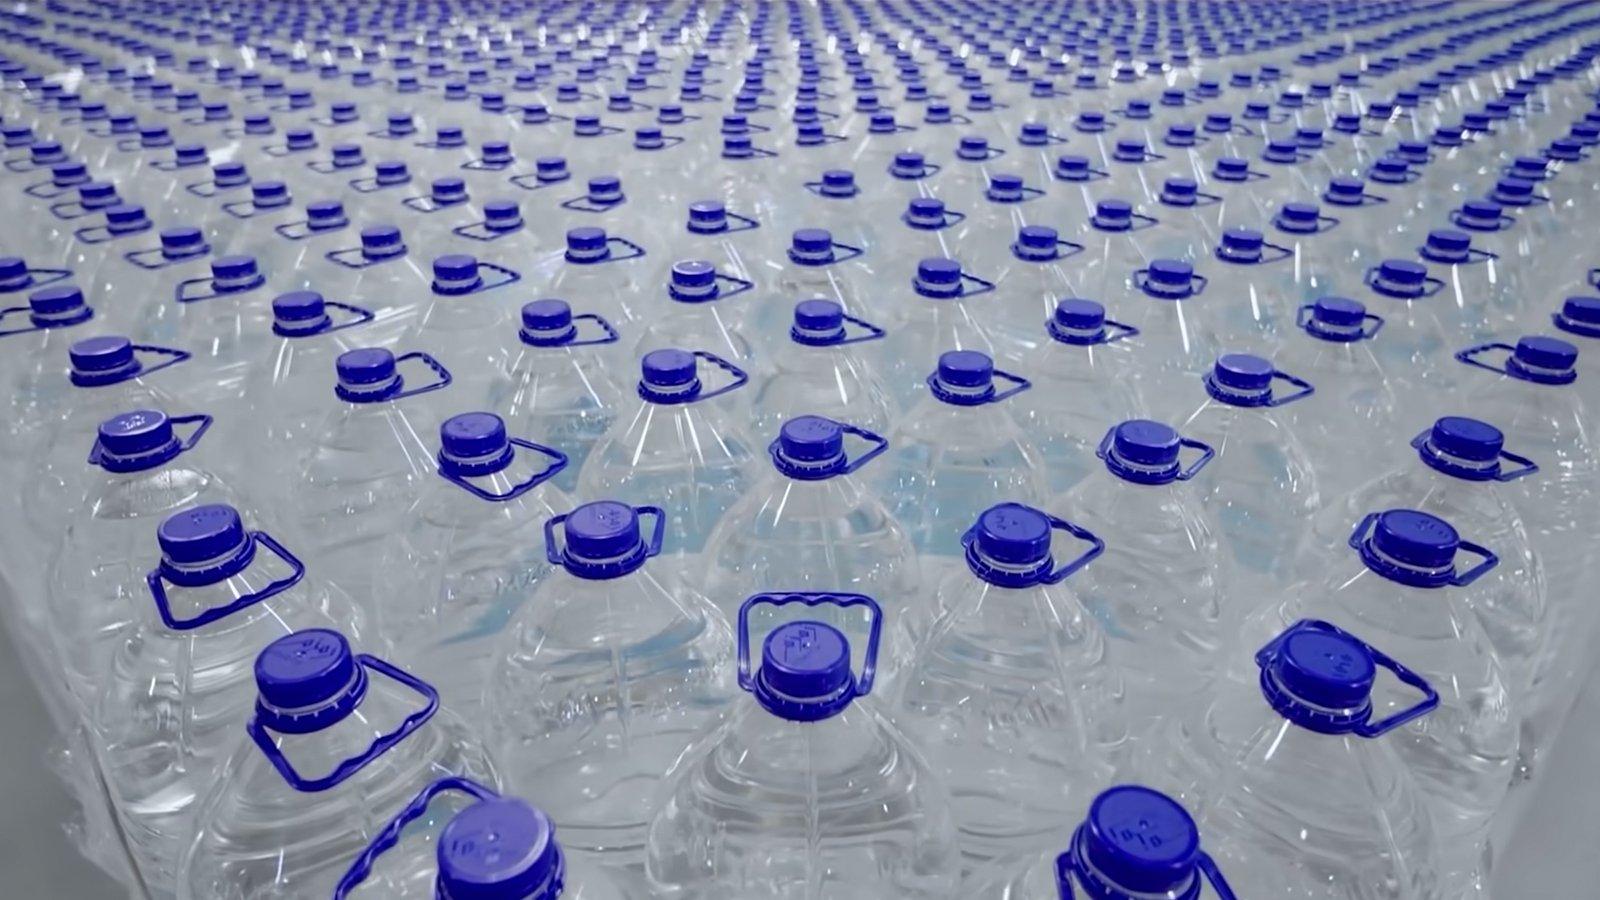 Bottles of zamzam water await distribution in Mecca, Saudi Arabia. Video screengrab